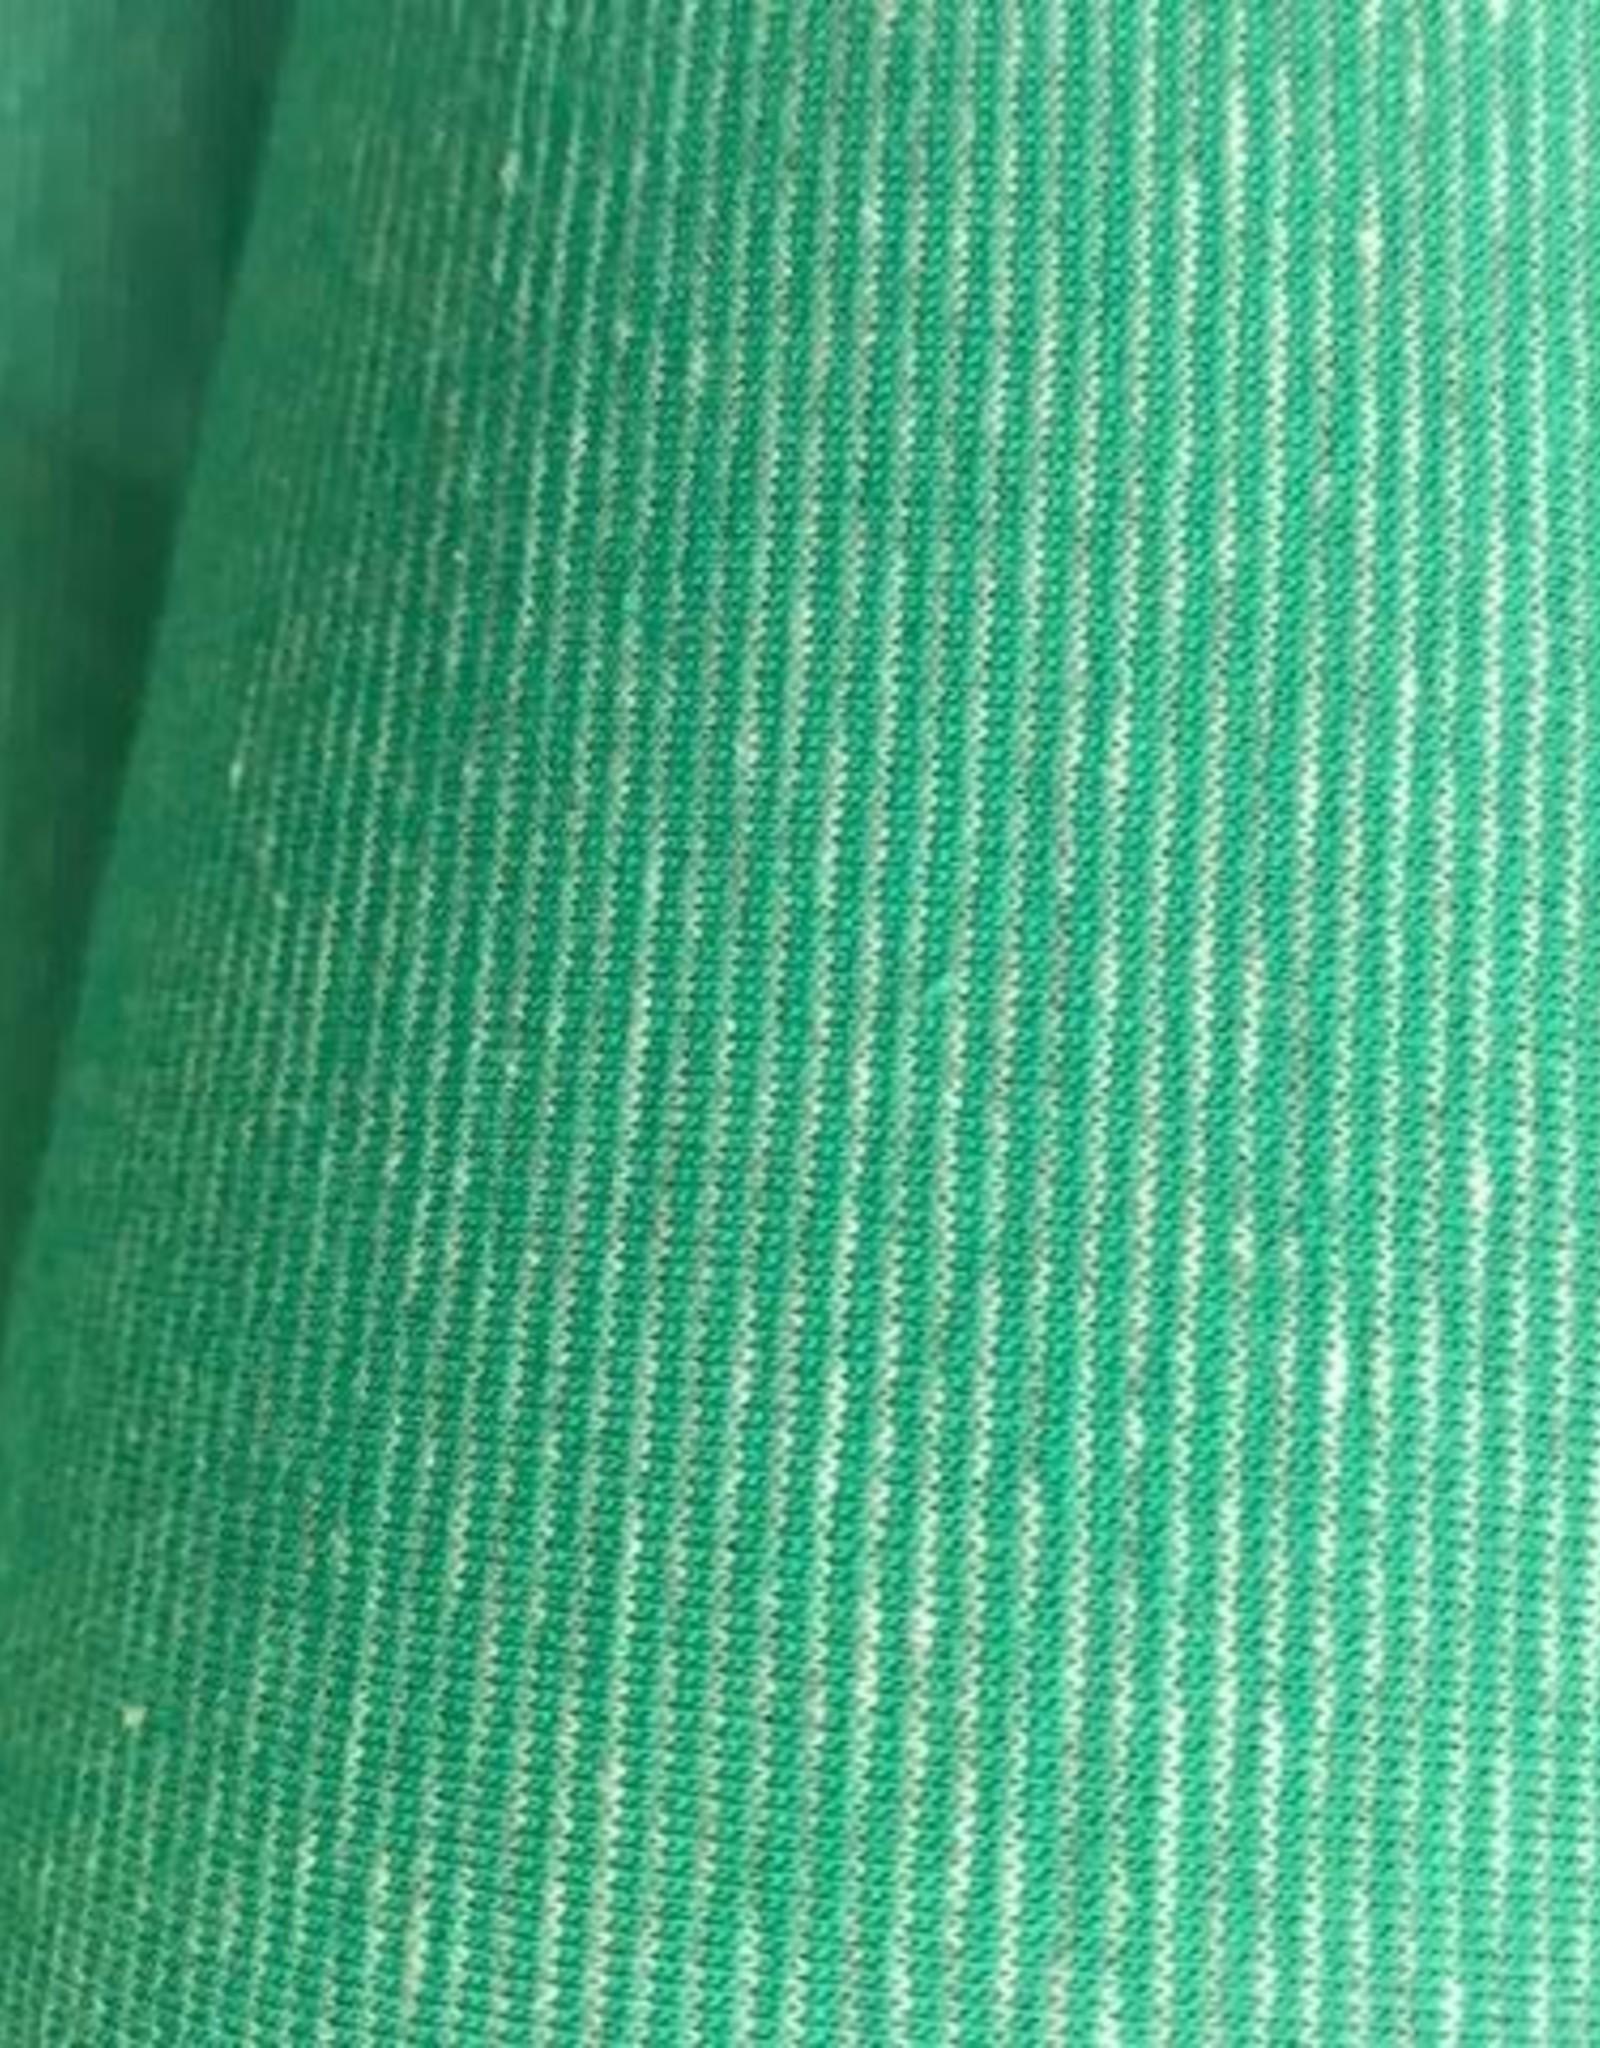 Poppy Sweat stripe brushed